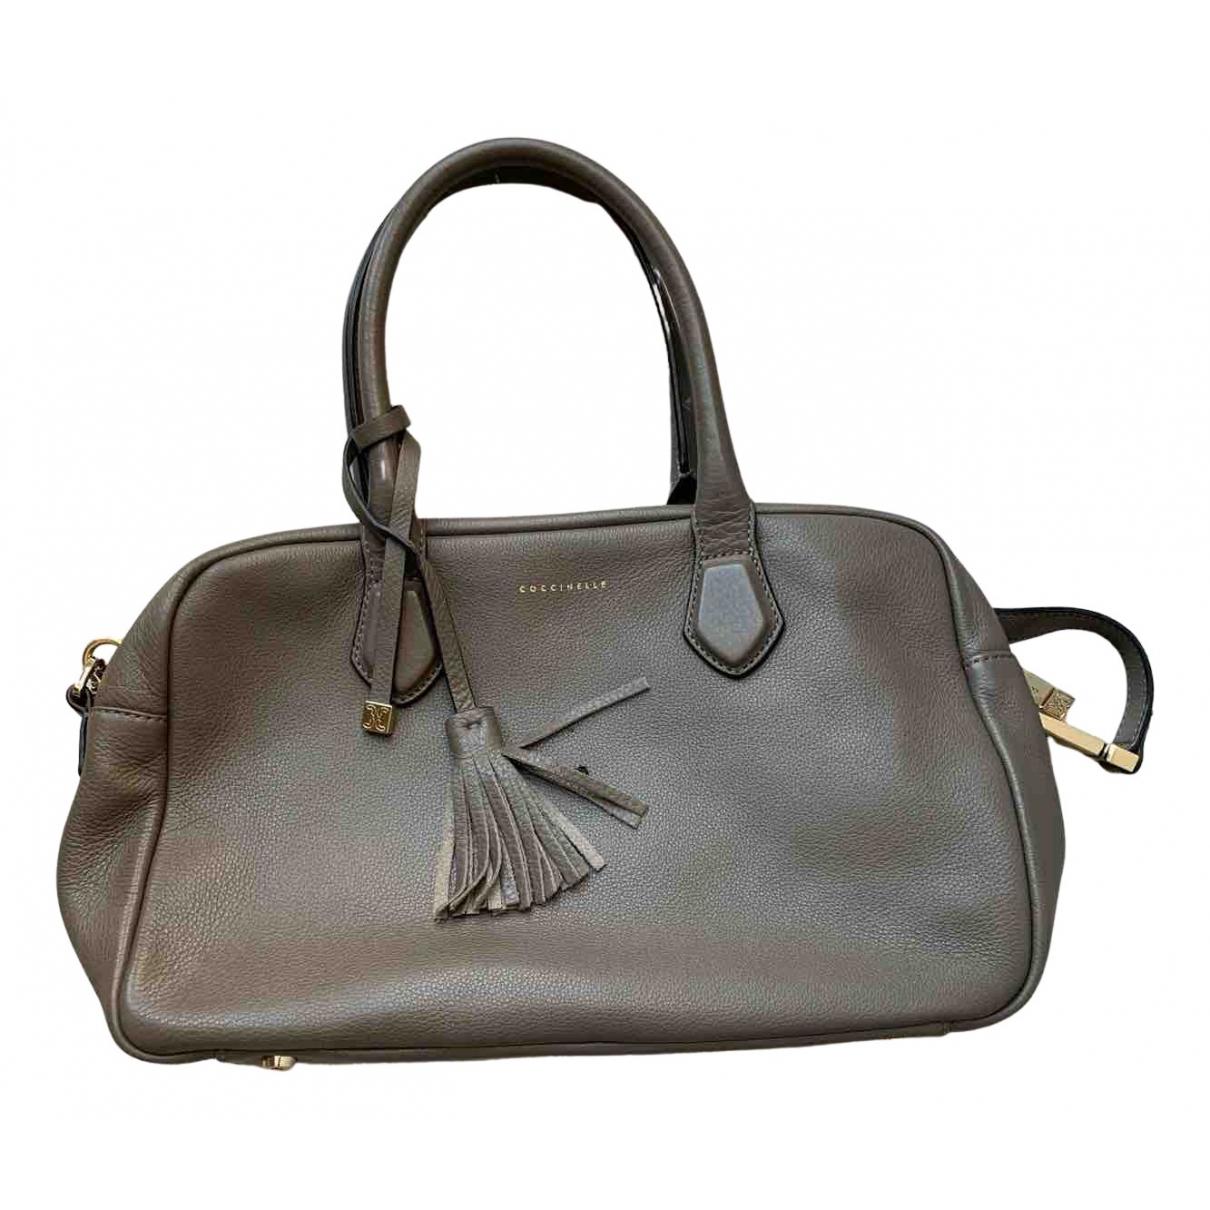 Coccinelle N Grey Leather handbag for Women N